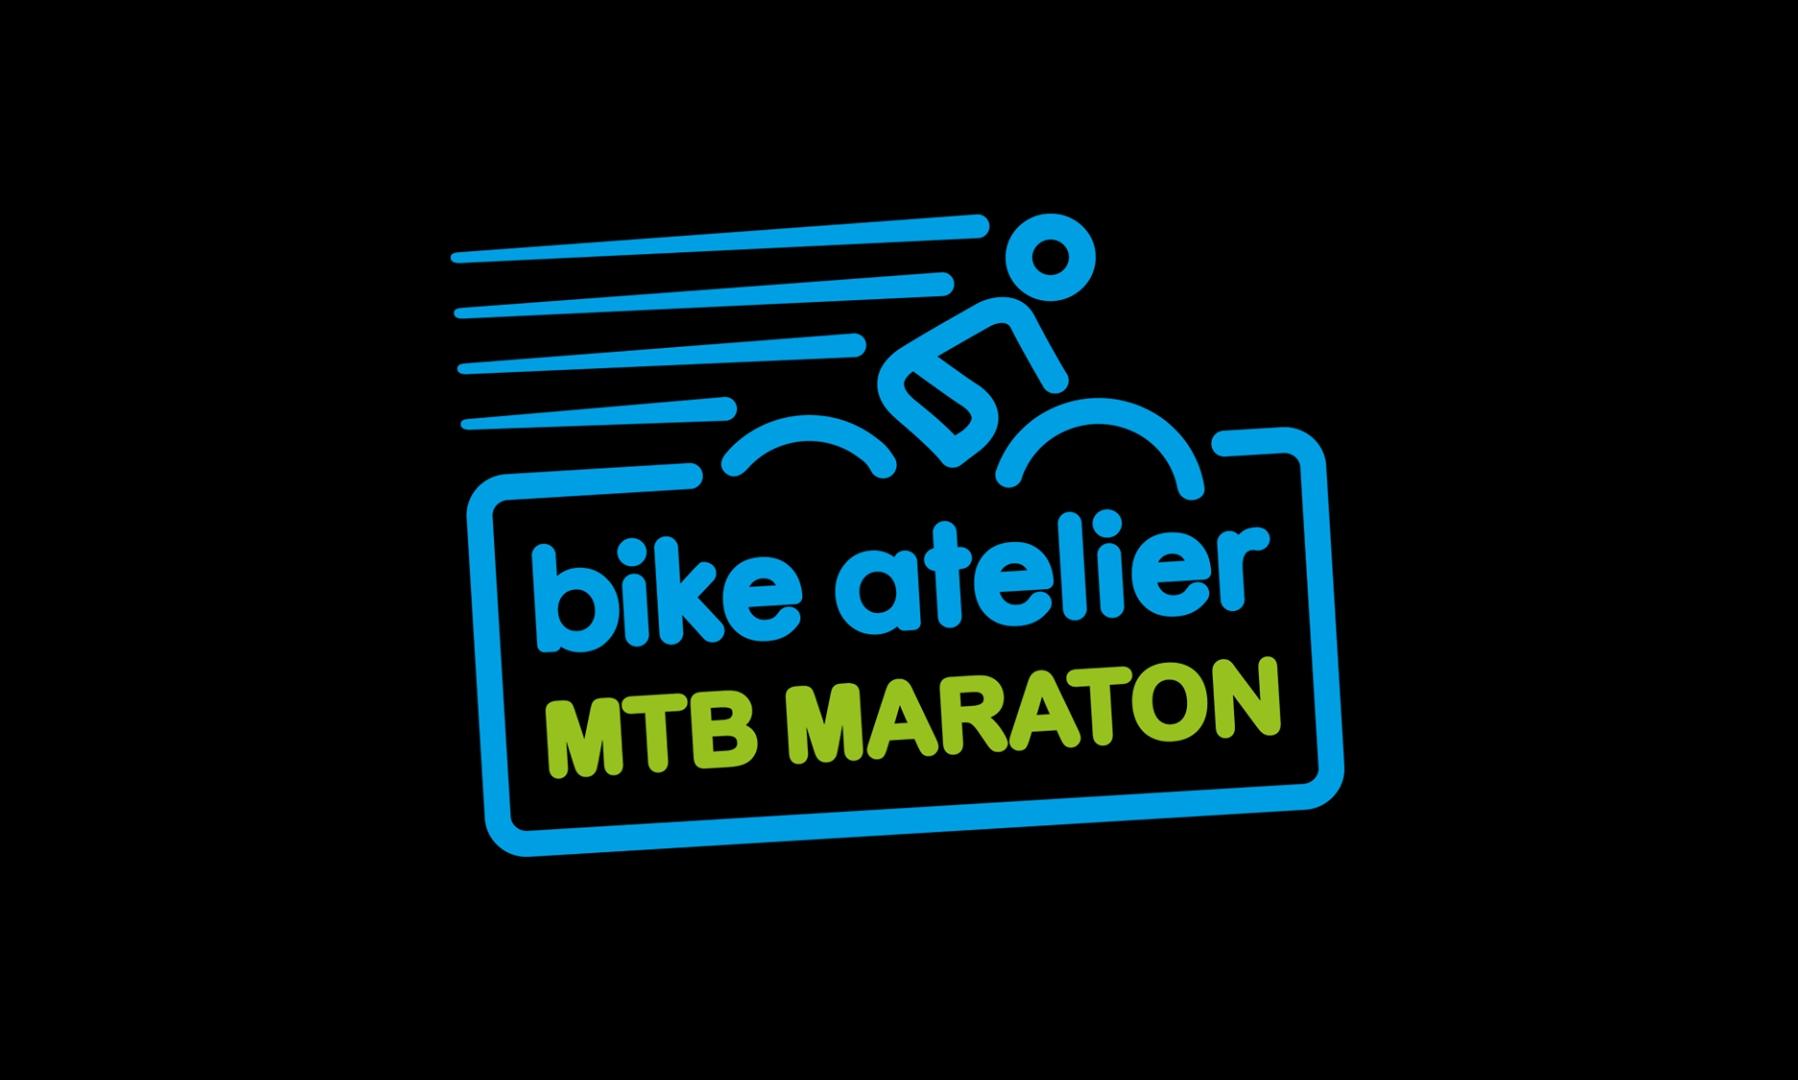 Kalendarz Bike Atelier Maraton 2017